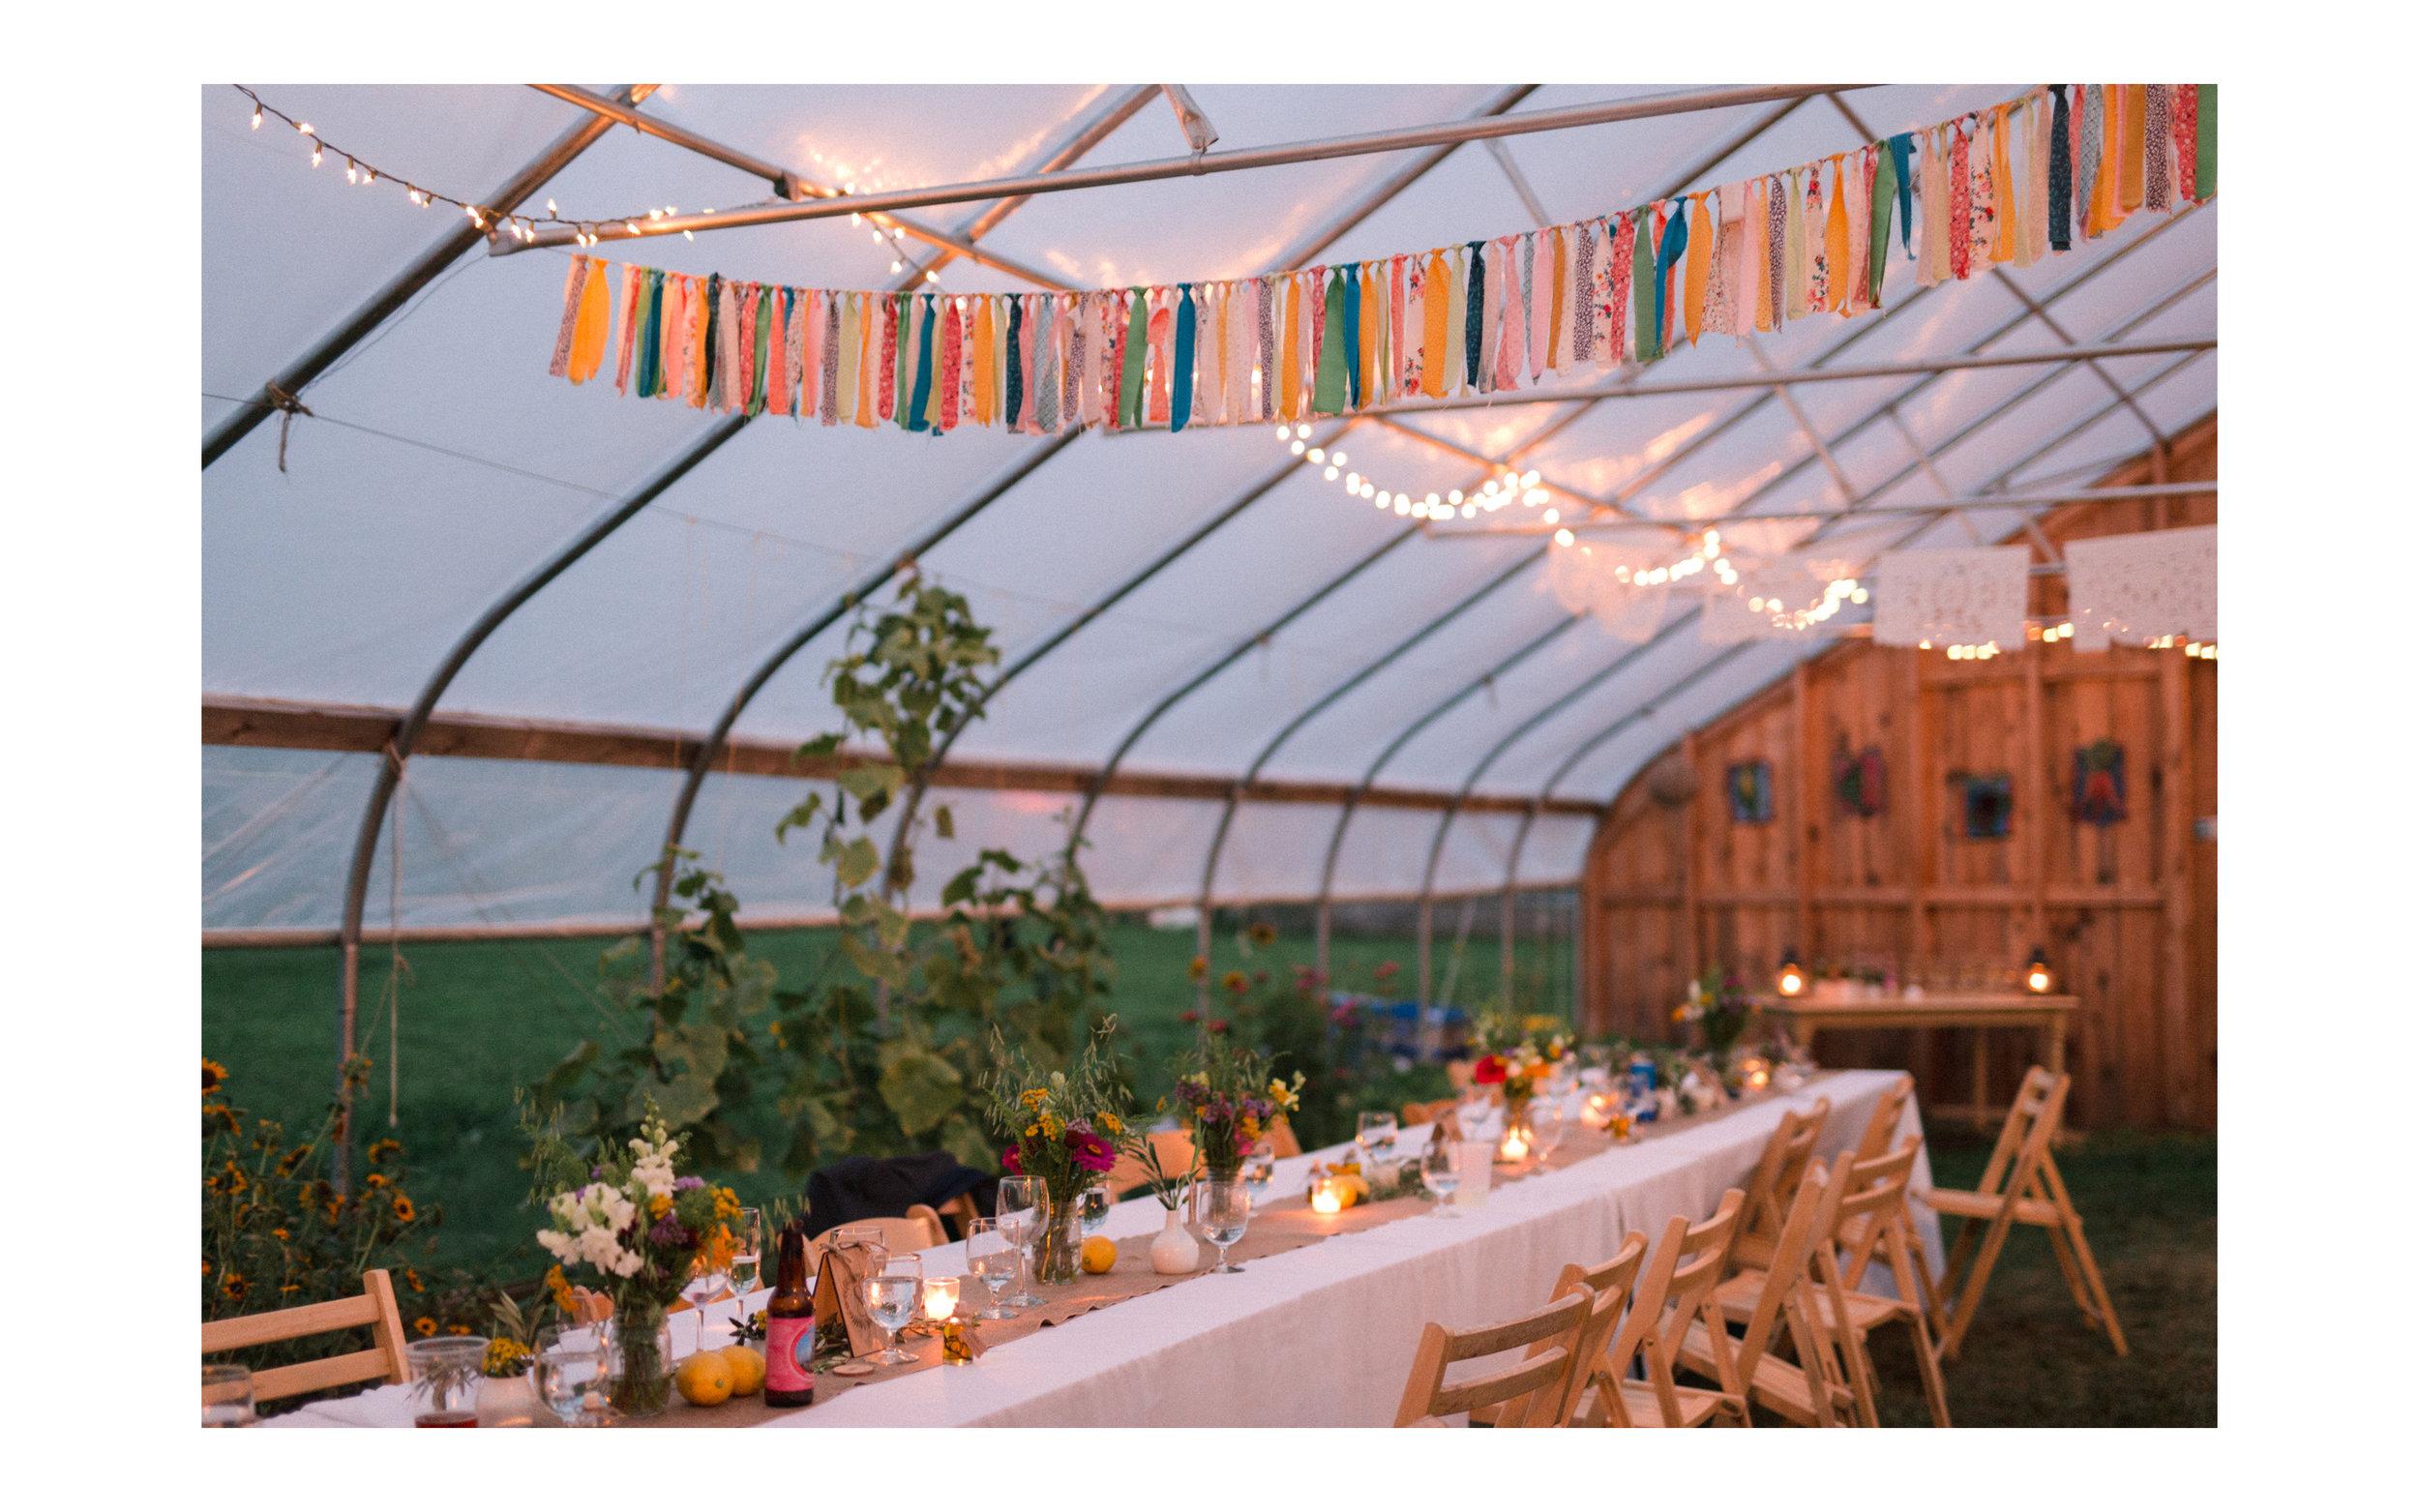 Stowe VT Farm Wedding Fine Art Wedding Photographer_Meg Haley Photographs_071.jpg